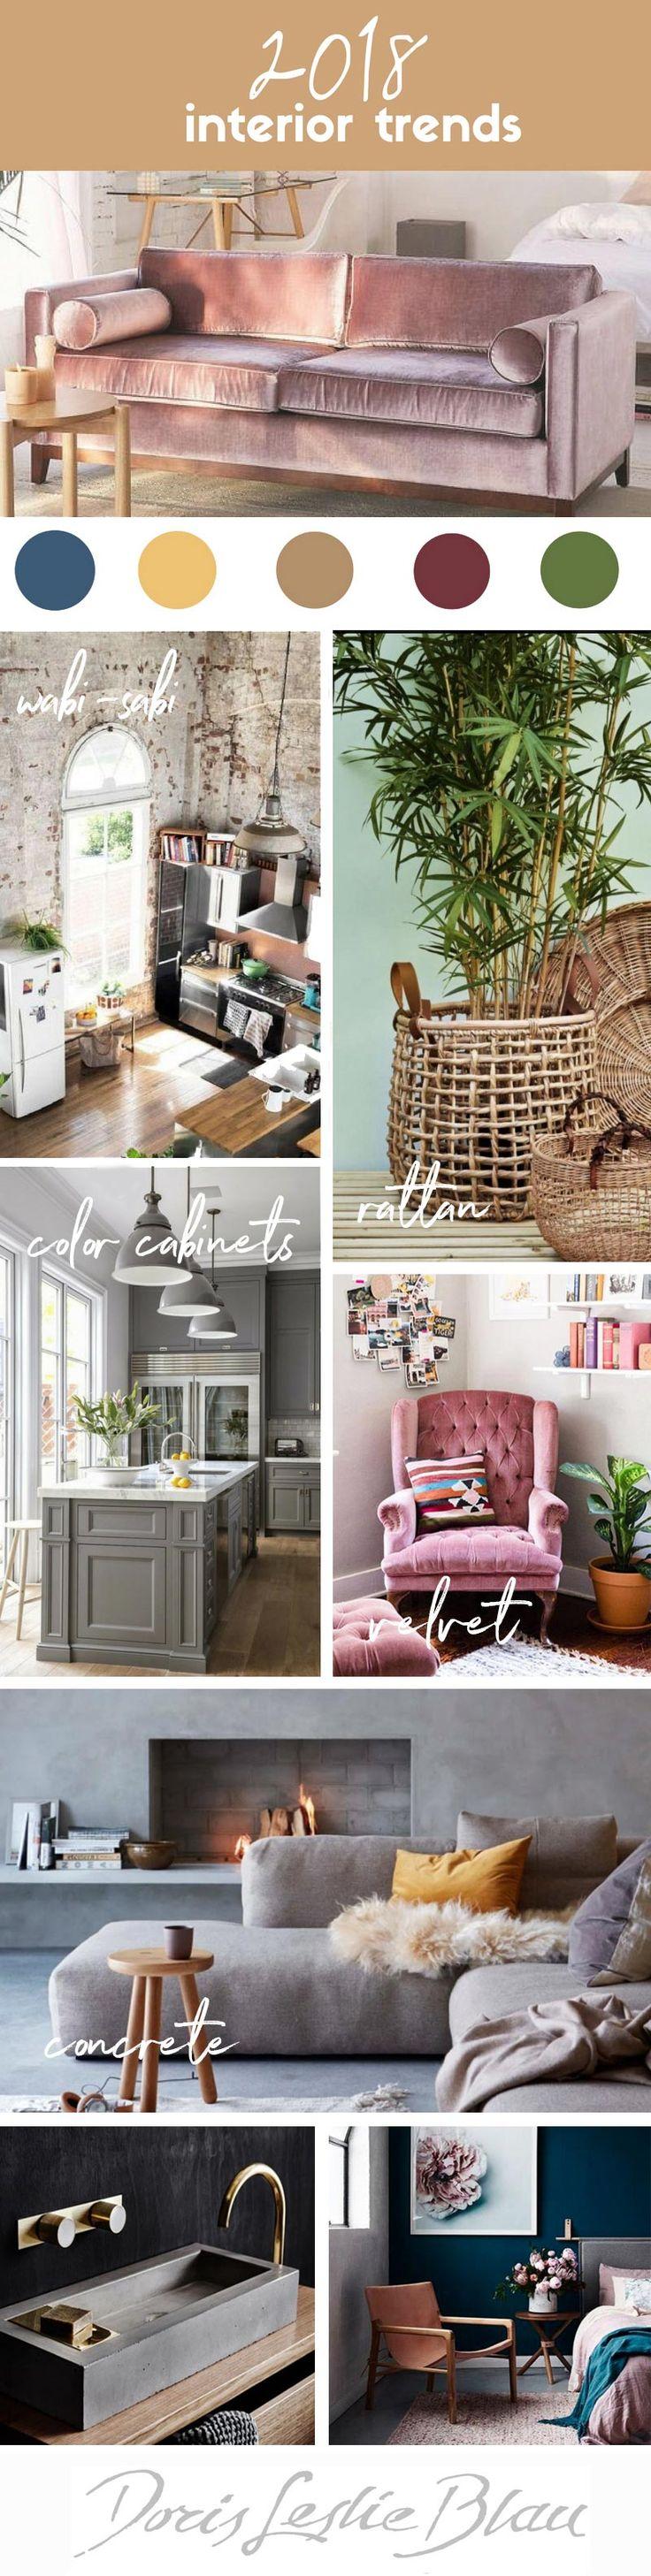 2018 interior decor trends, wabi-sabi interior, concrete interior decor, velvet sofa, rattan decor, millennial pink, emerald green decor, concrete sink